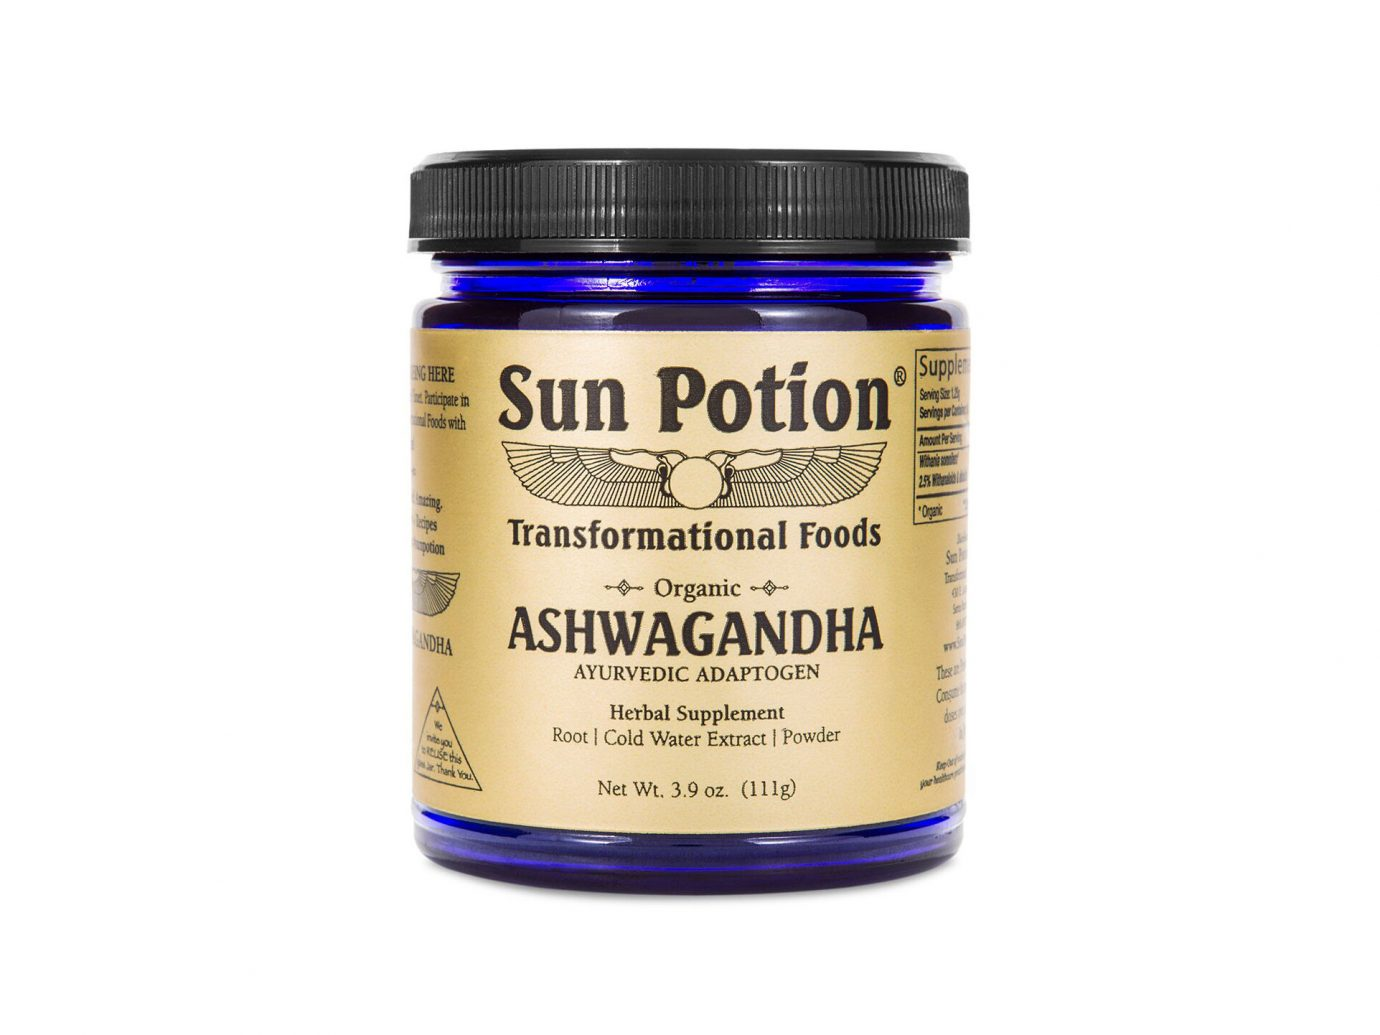 Sun Potion Ashwagandha Supplements